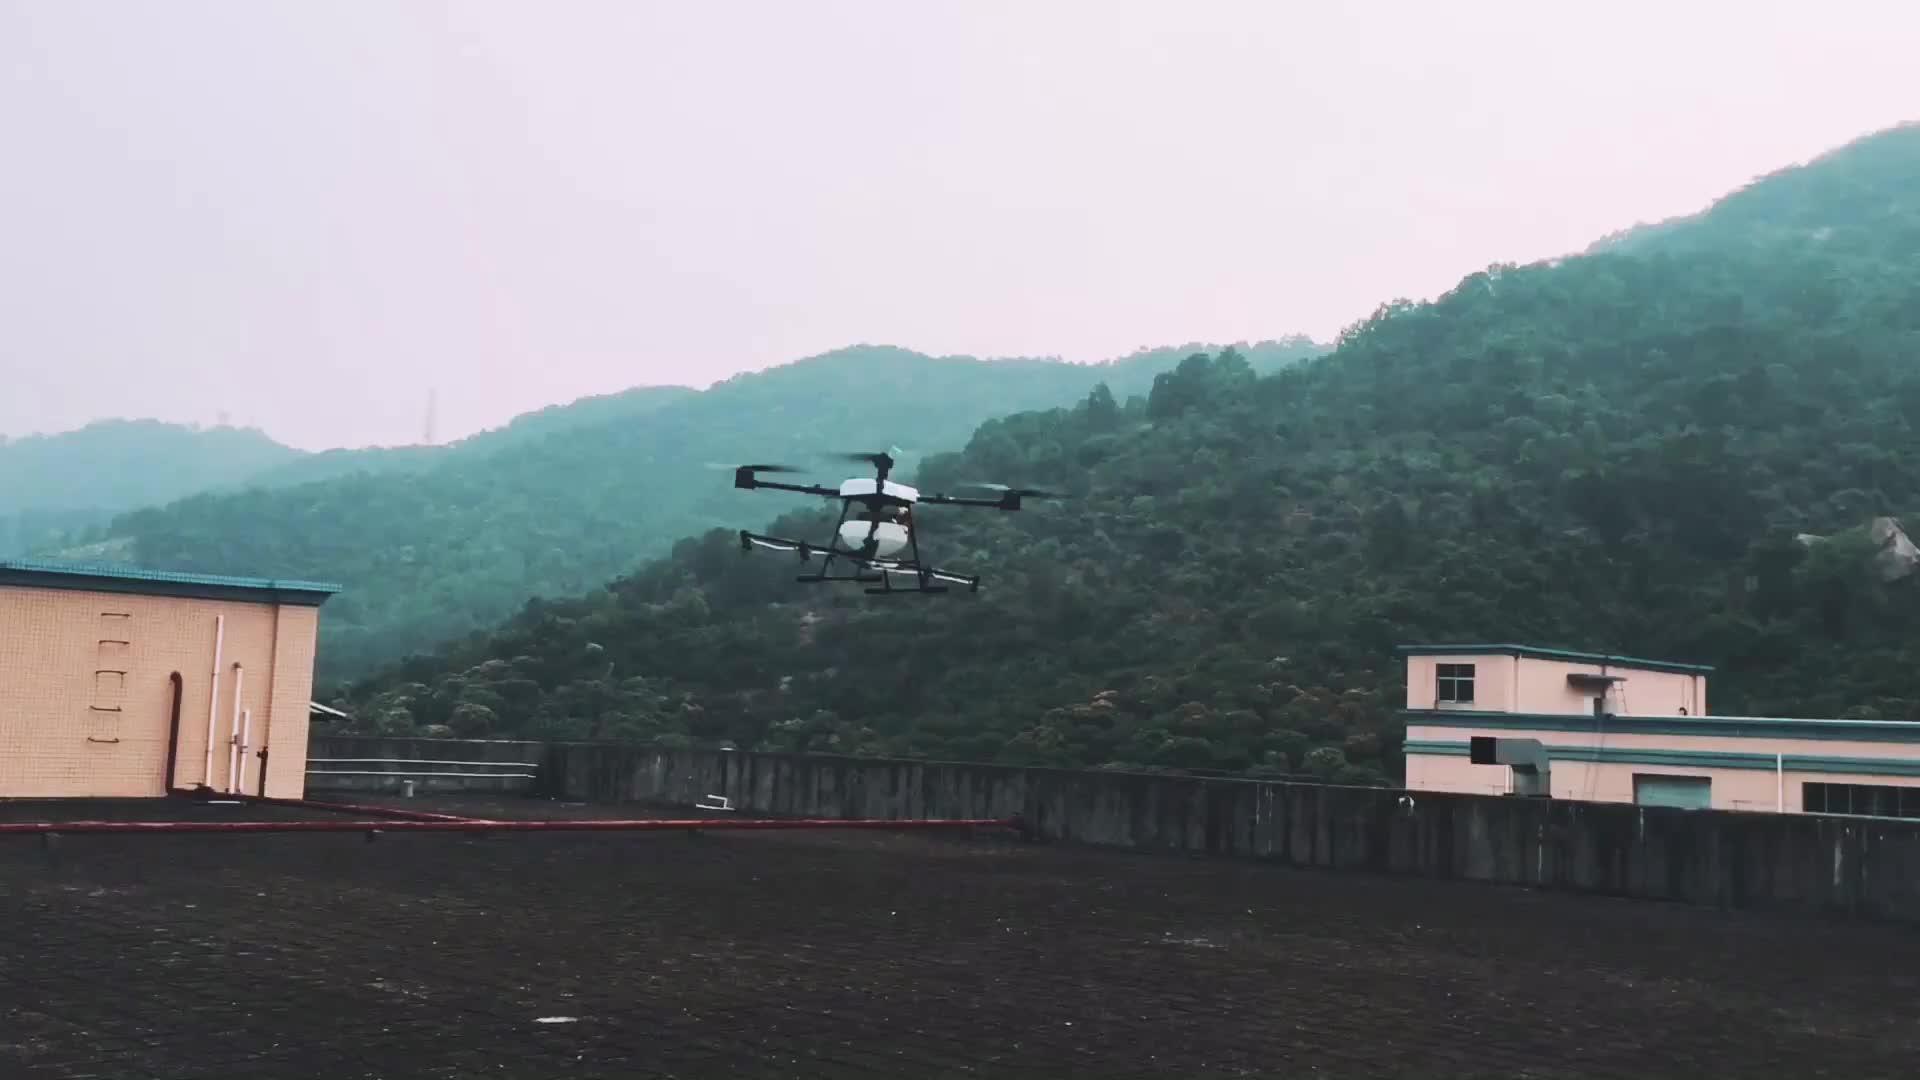 10KG 15KG Agricultural Drone Spark Folding Drone Frame With Auto Pilot Function UAV China Manufacturer